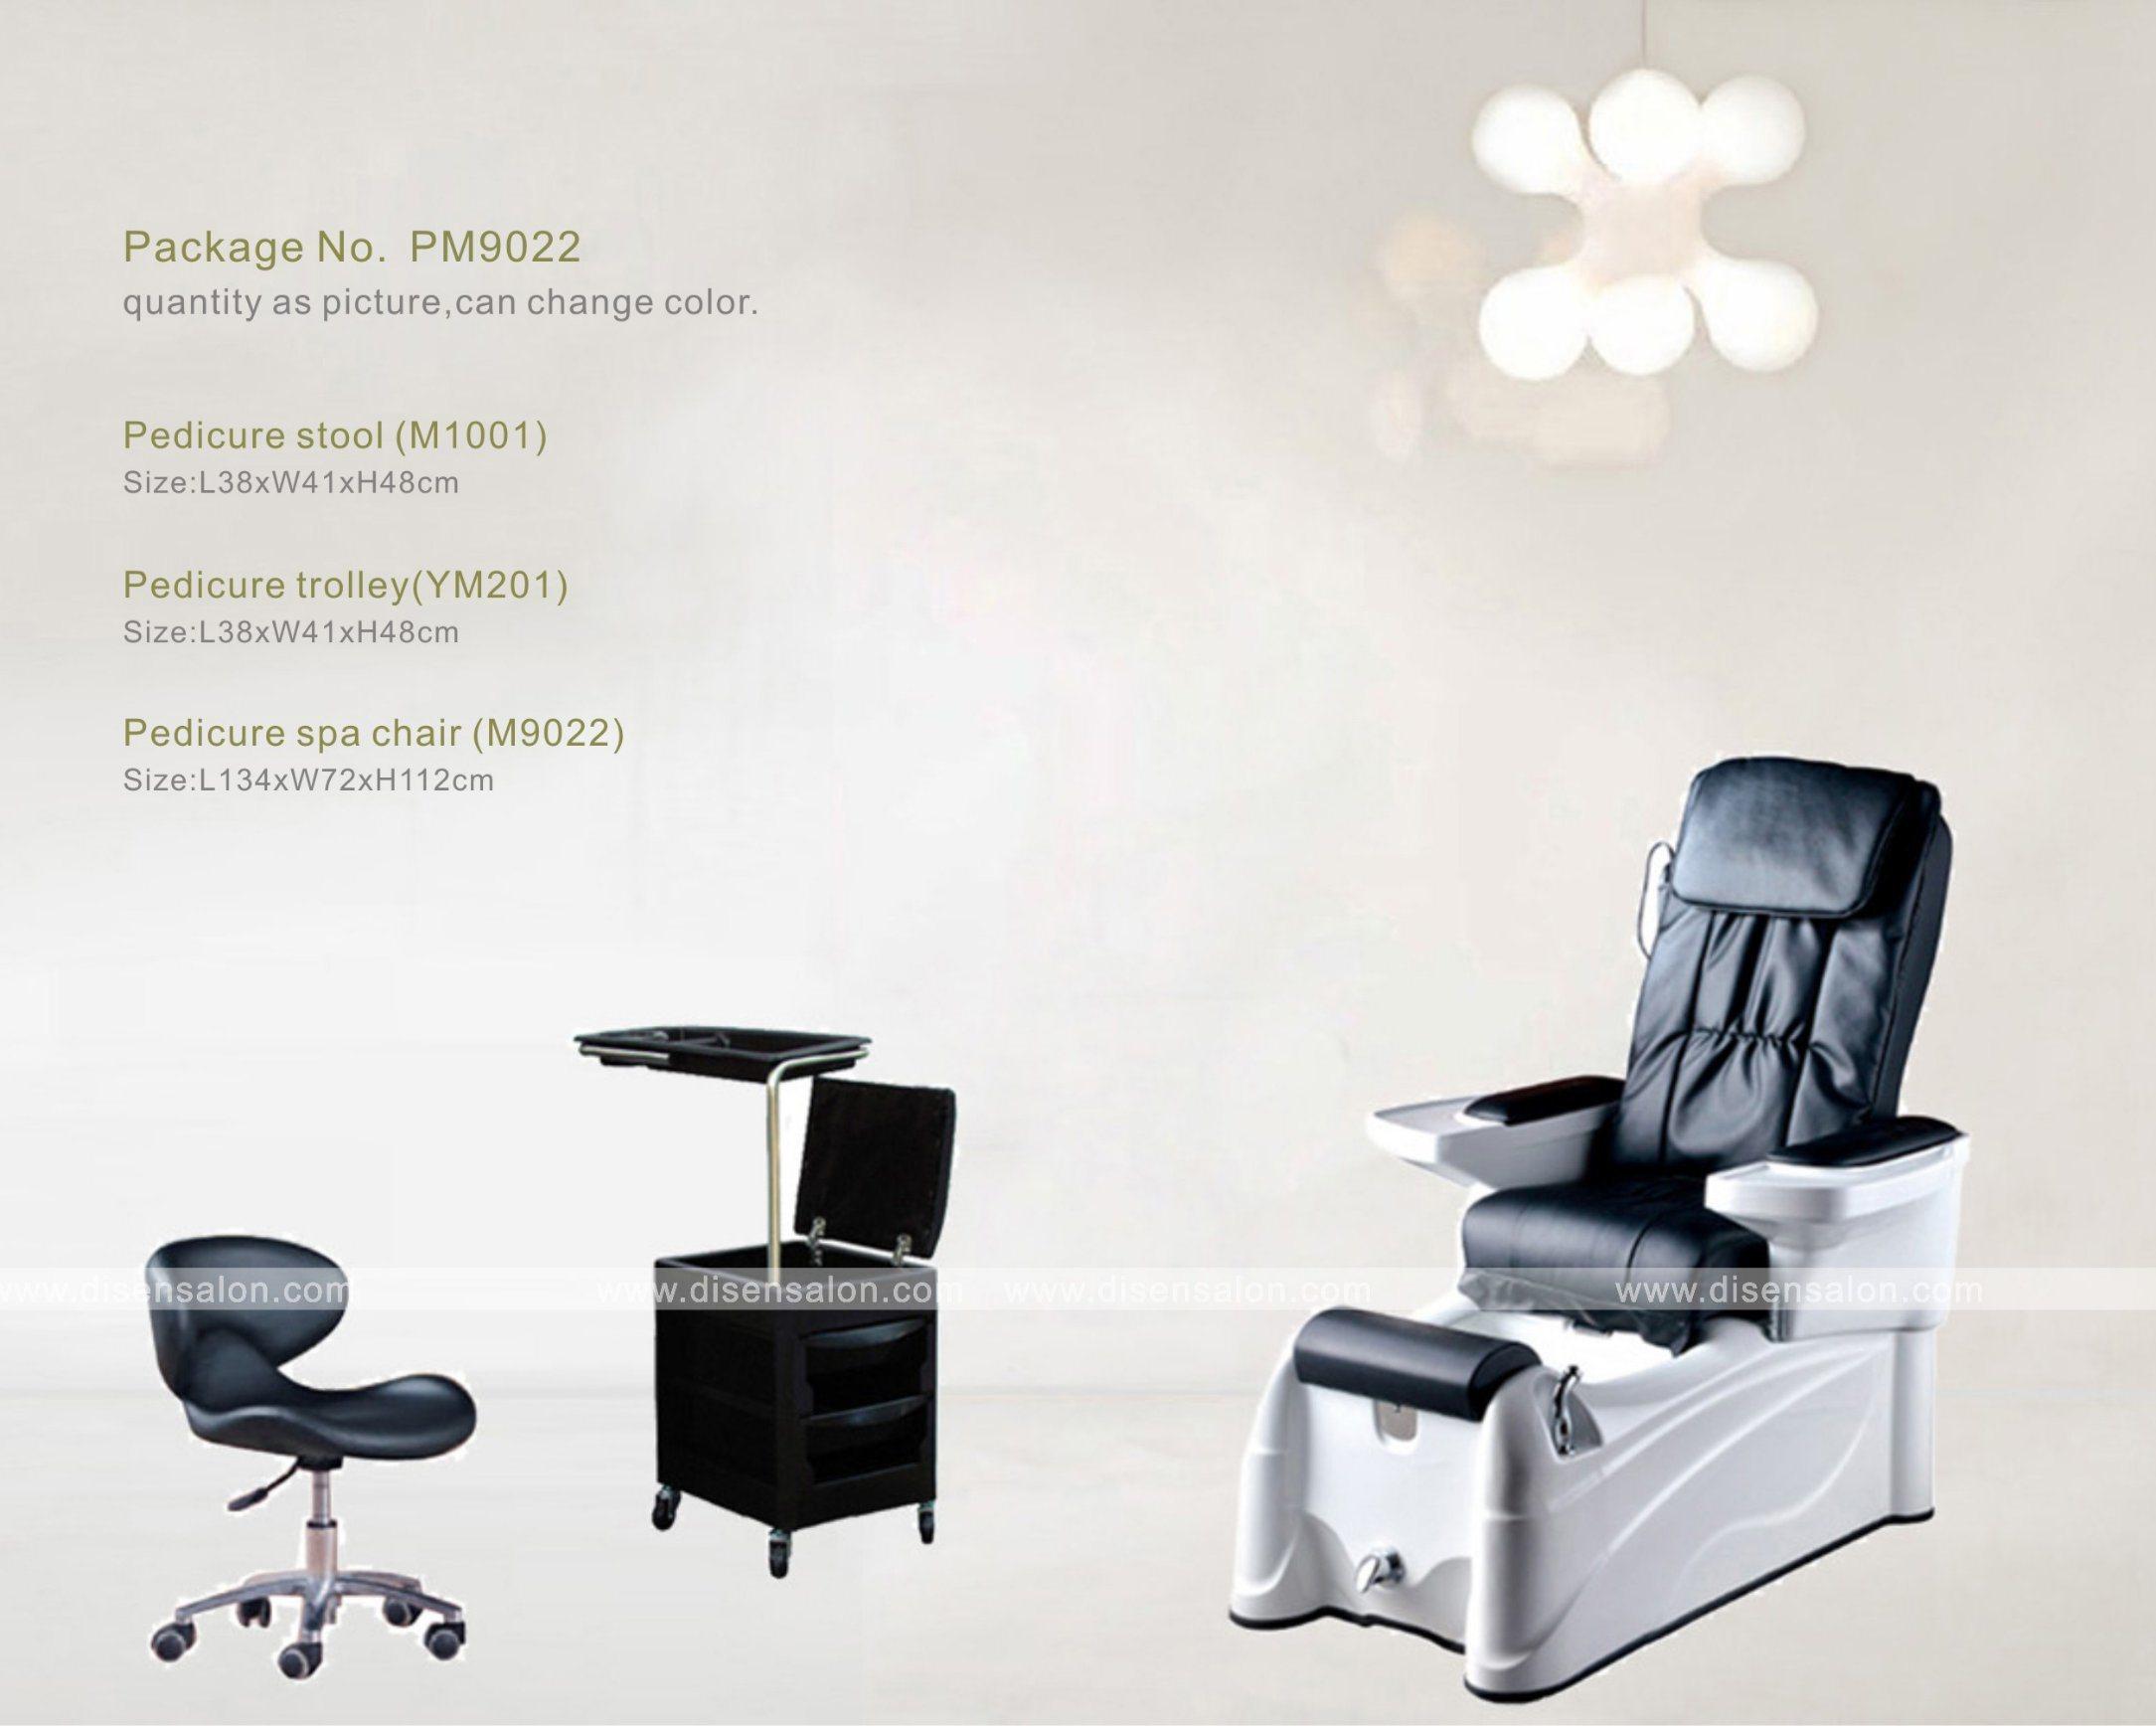 Pedicure Foot SPA Chair (M9022)